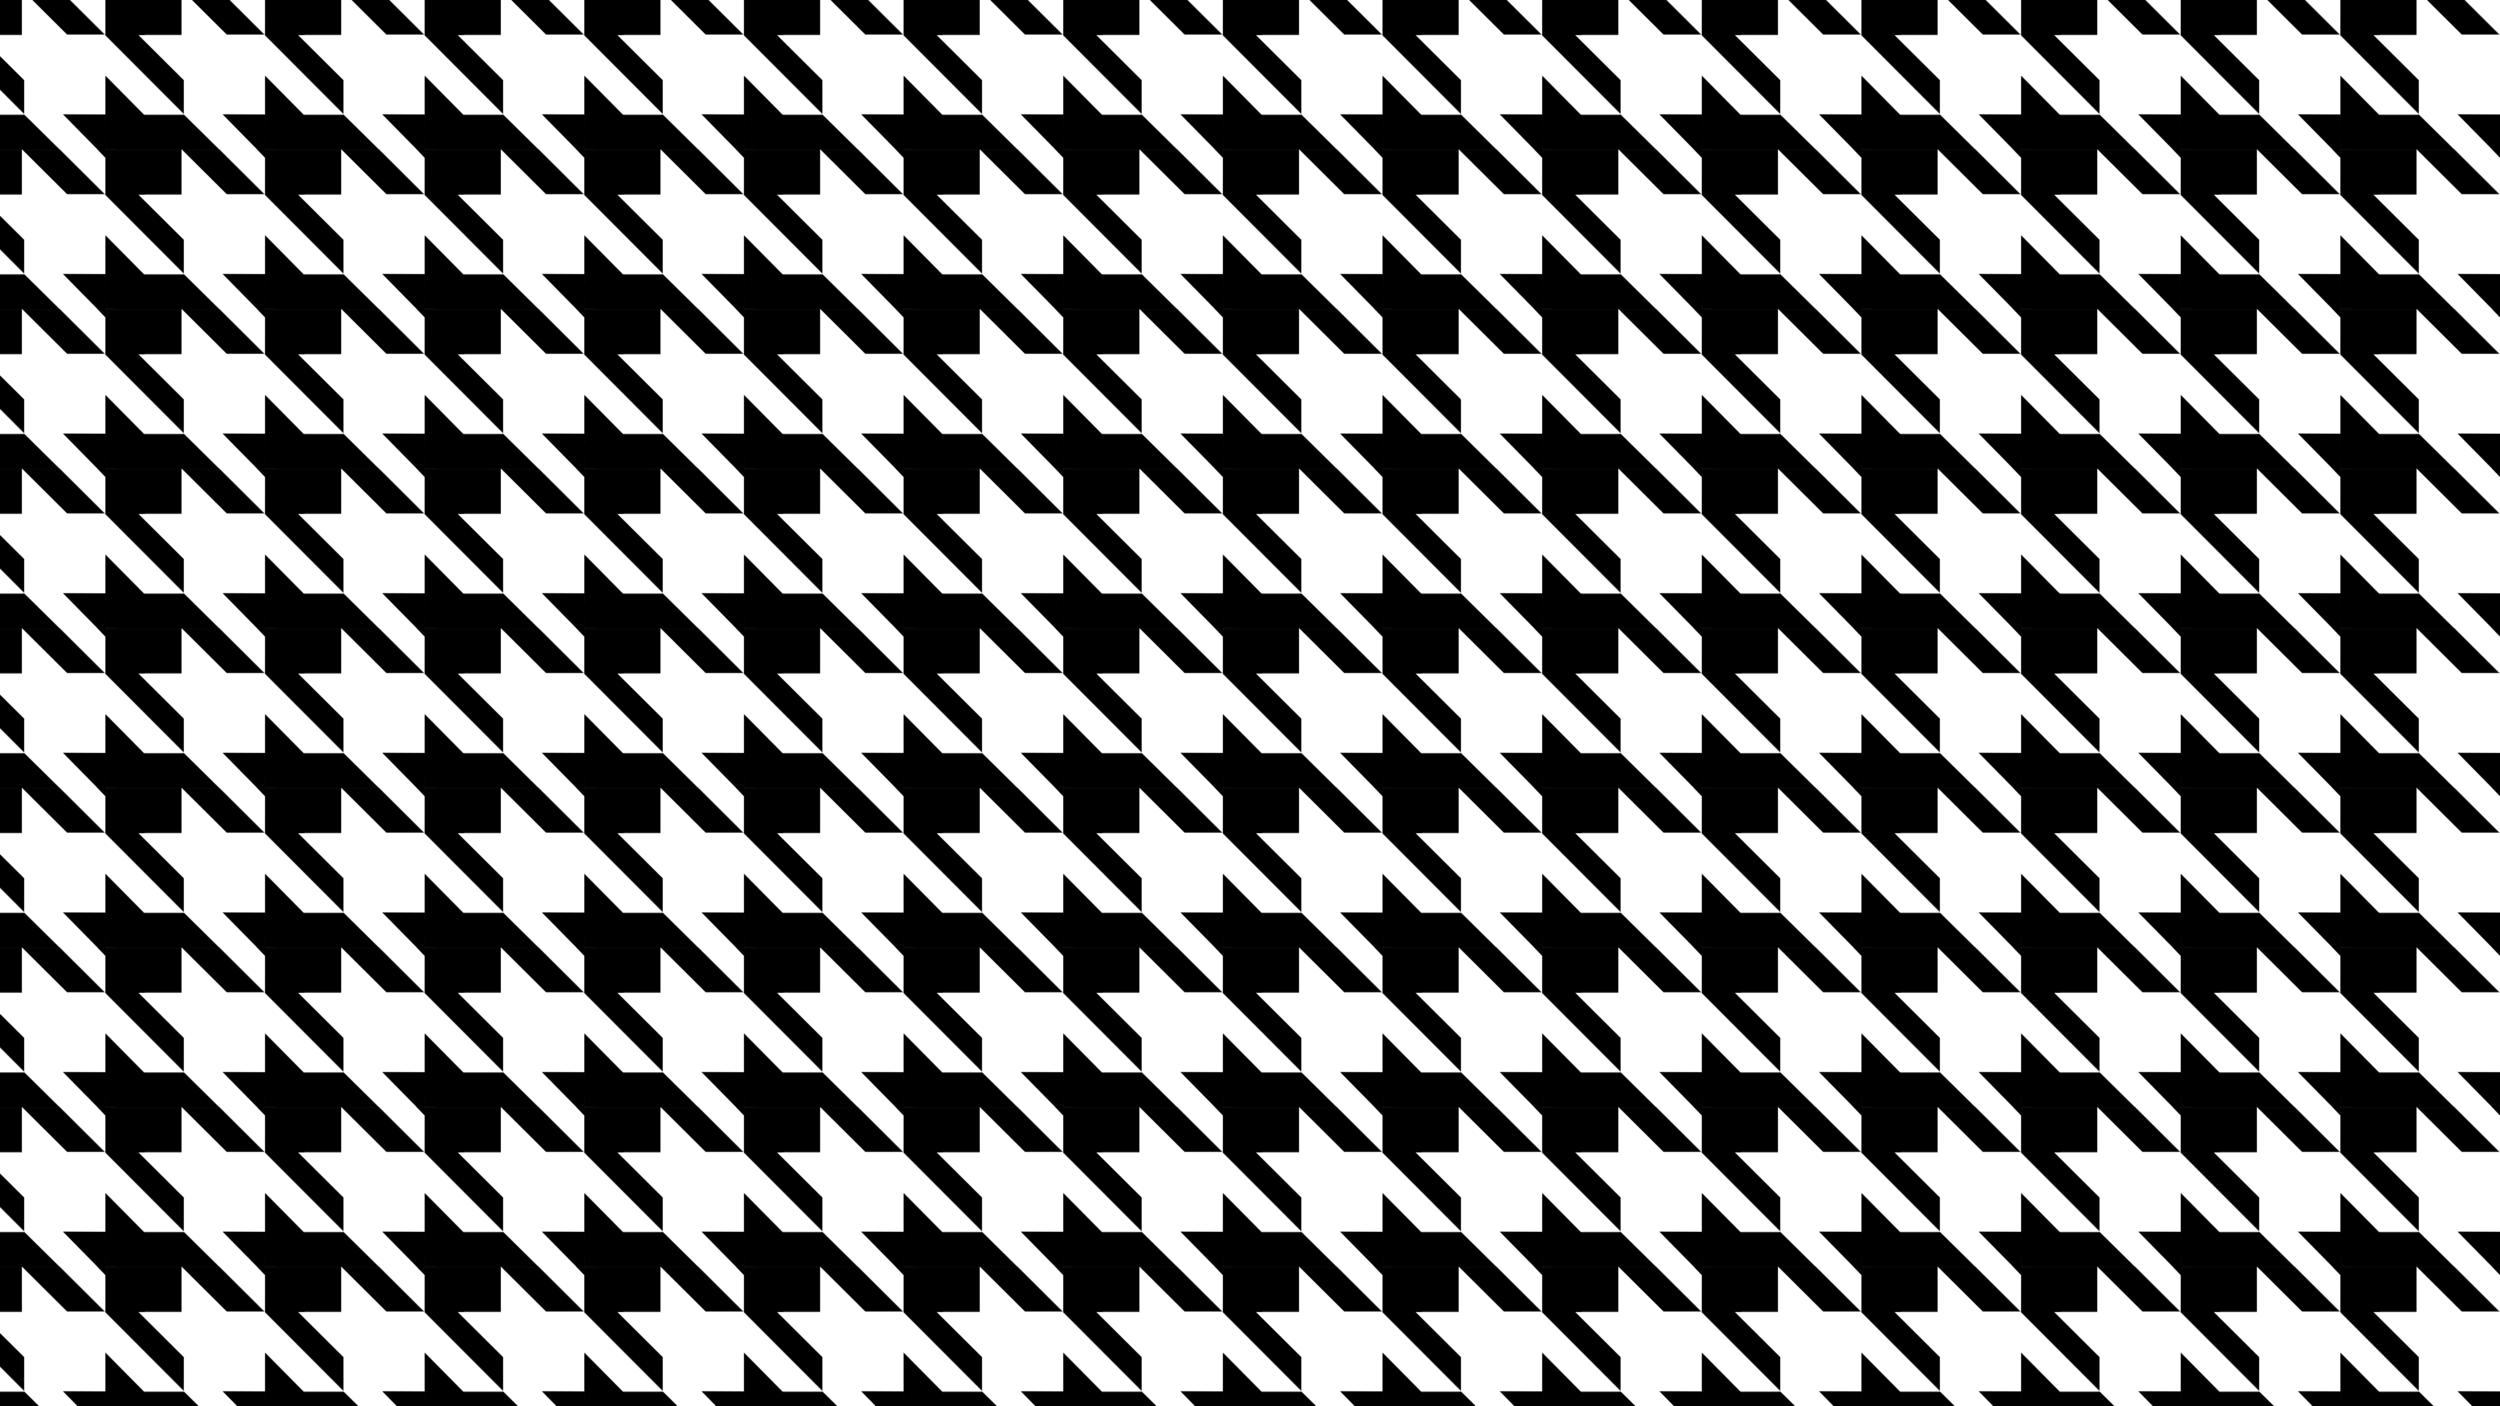 pattern-hahnentritt.png